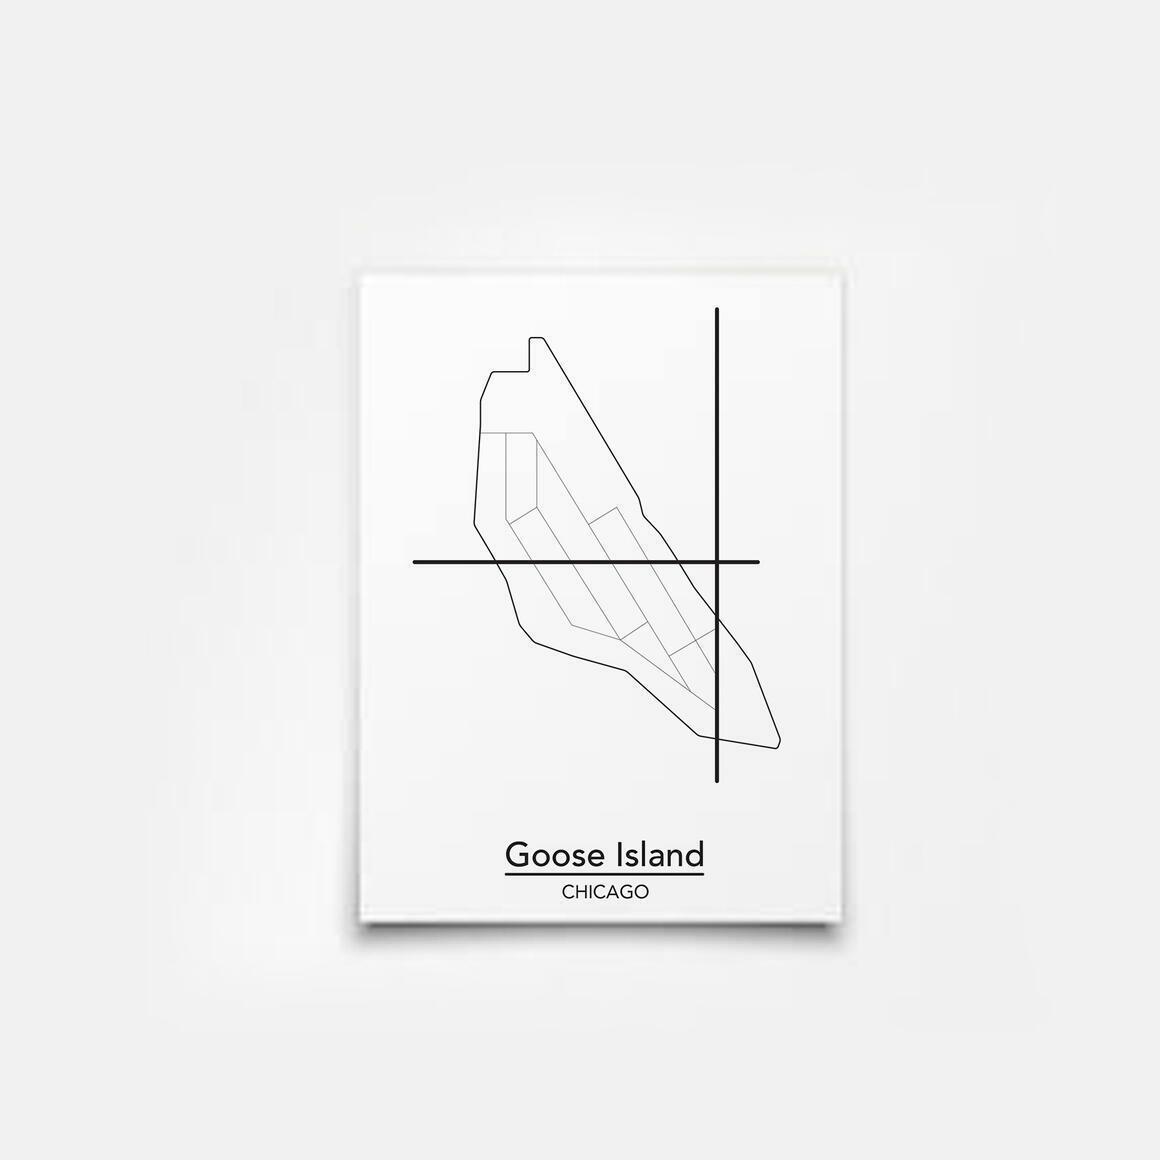 Goose Island - Chicago Neighborhood Map Print   Trada Marketplace